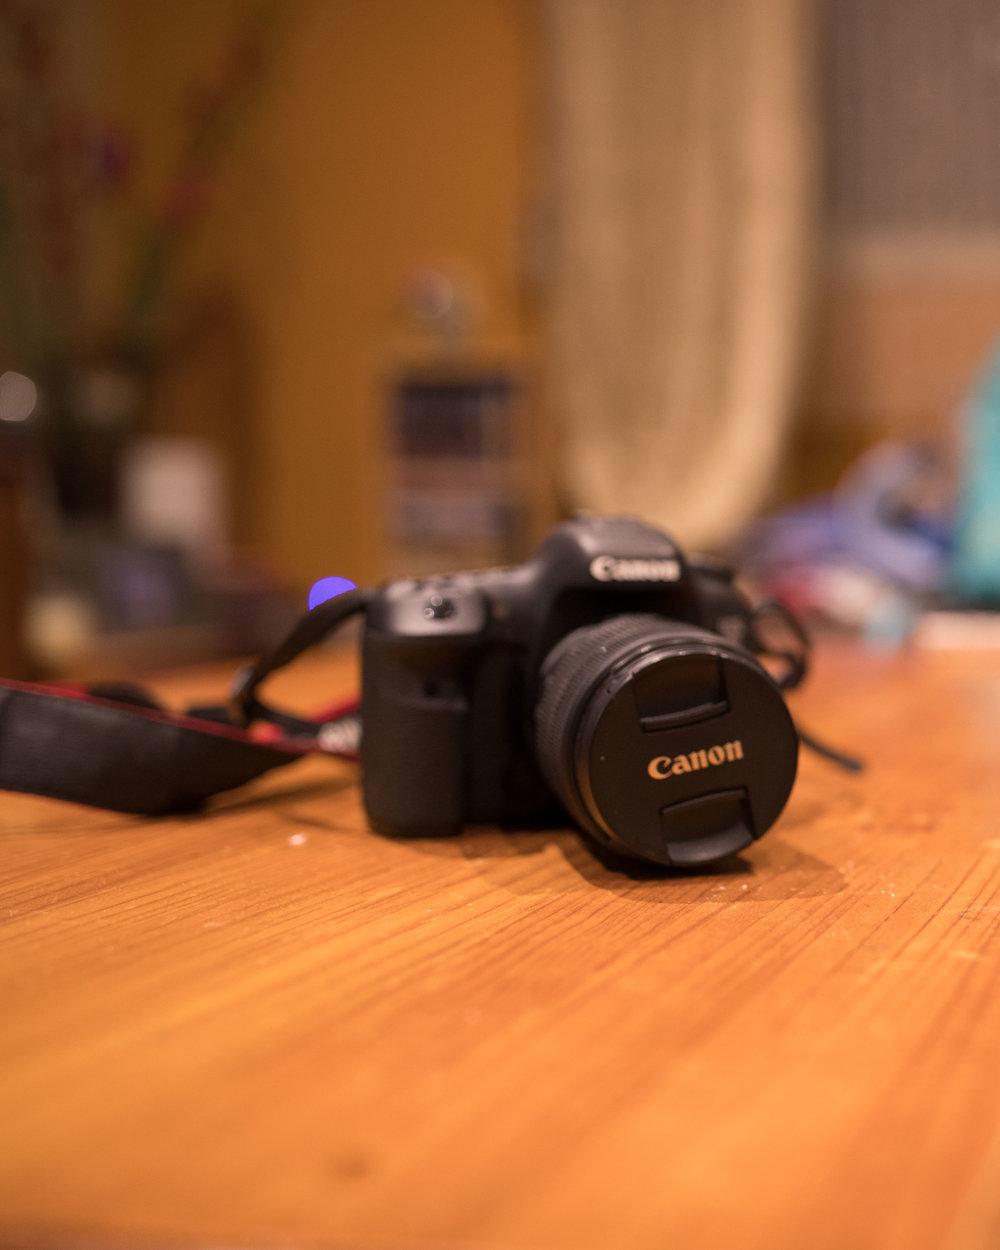 Shot at 35mm Focal- Aperture f1.4